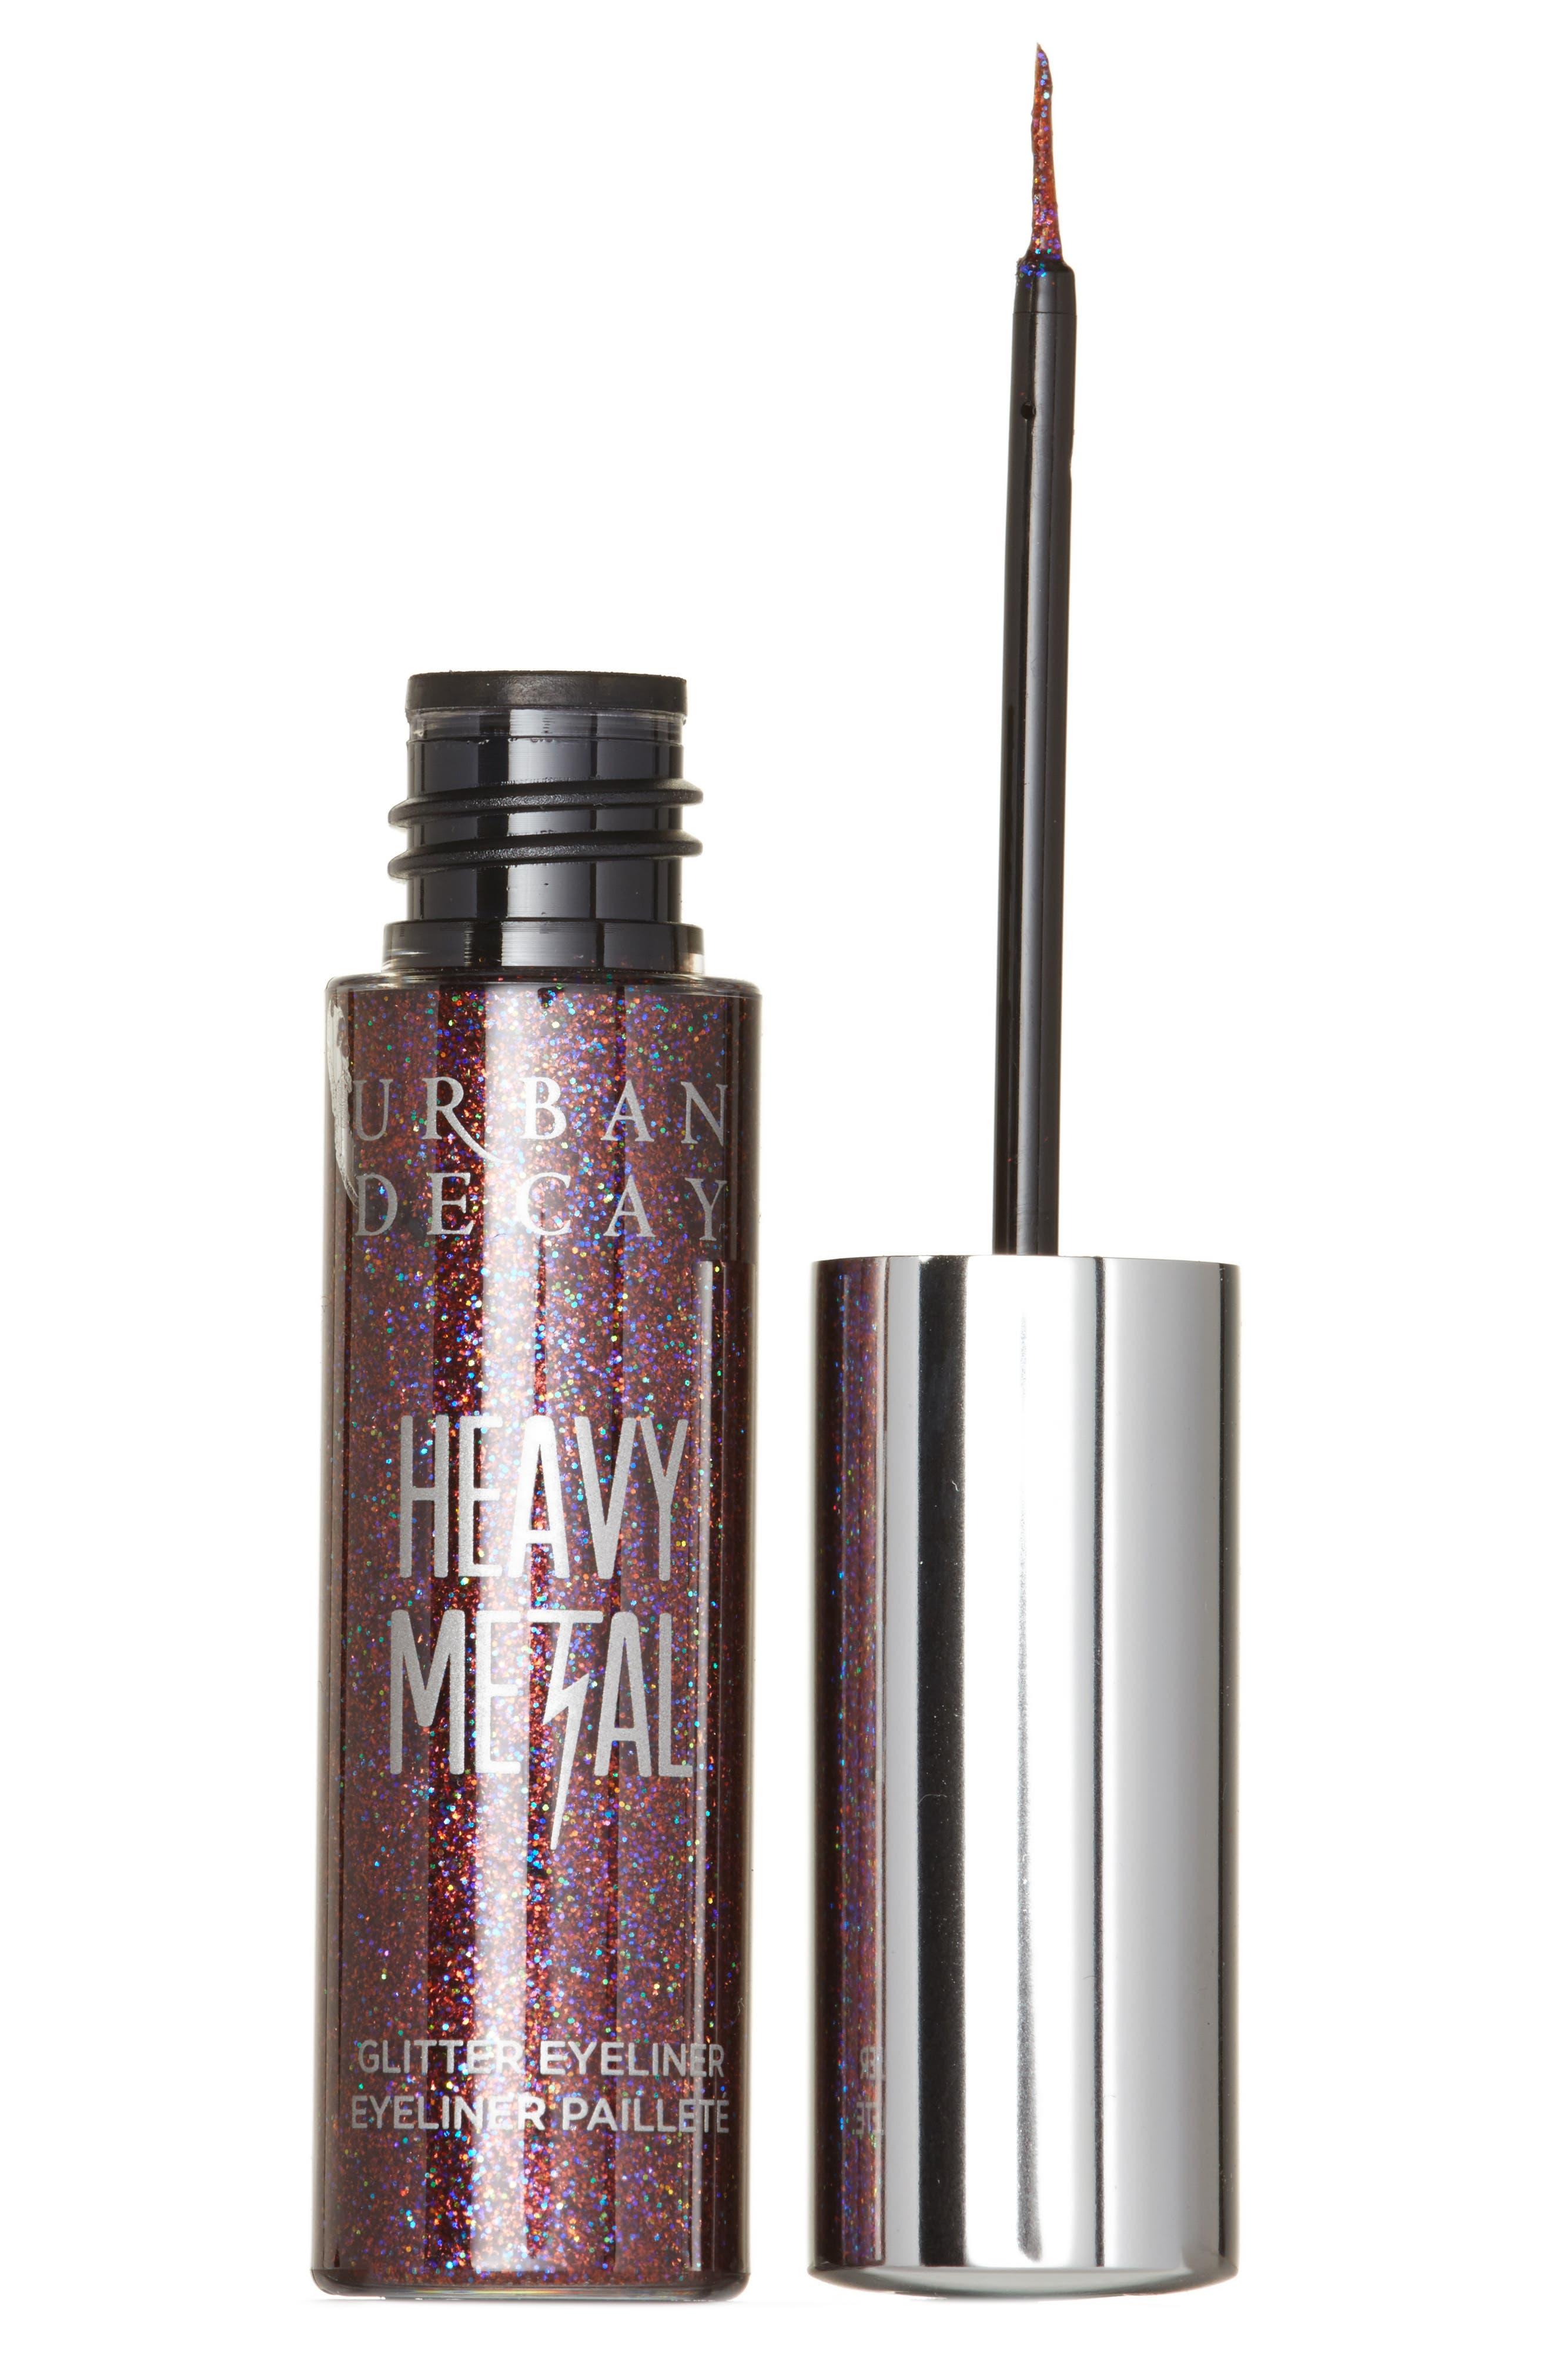 Heavy Metal Glitter Eyeliner,                             Main thumbnail 2, color,